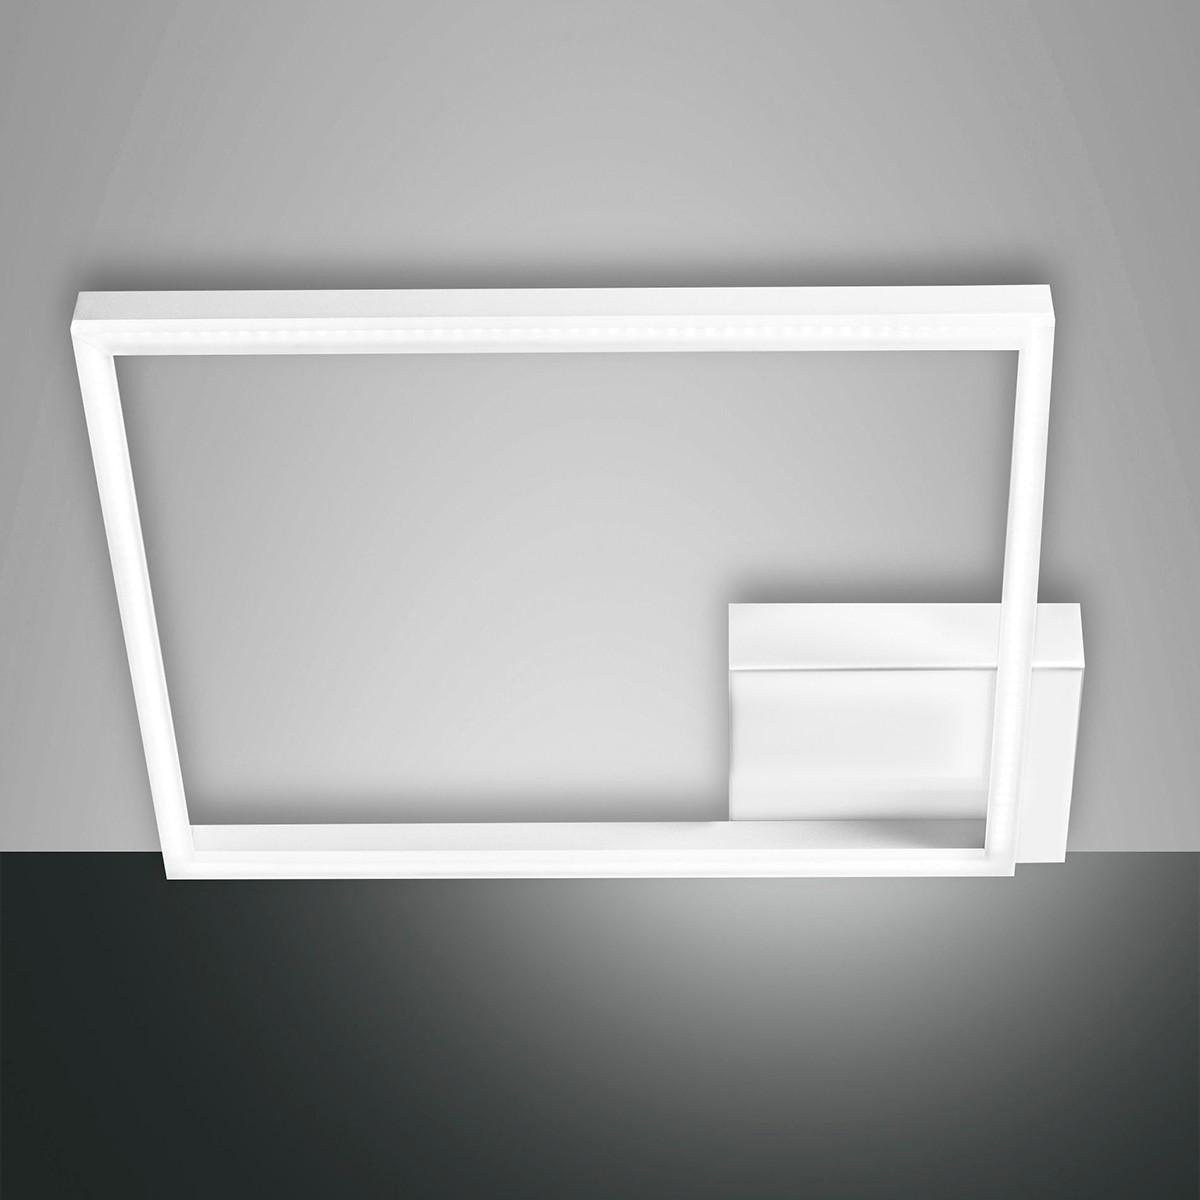 Fabas Luce Bard 3394-61 LED Deckenleuchte, weiß